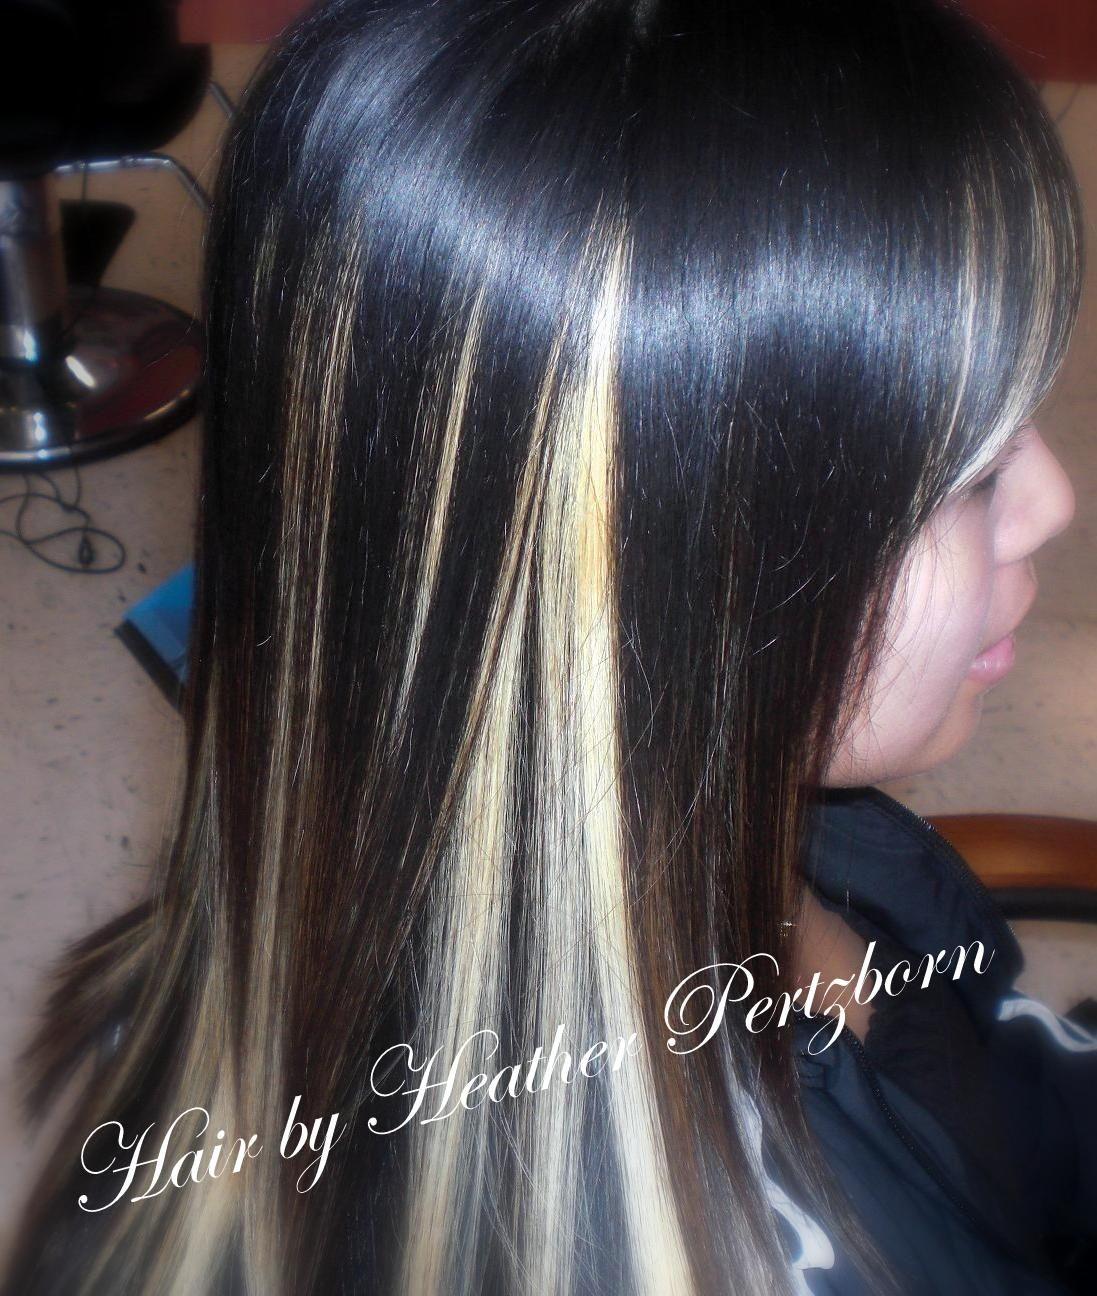 Ad4265b728e29d85d0ff42322d052480 Jpg 1 097 1 296 Pixels Hair